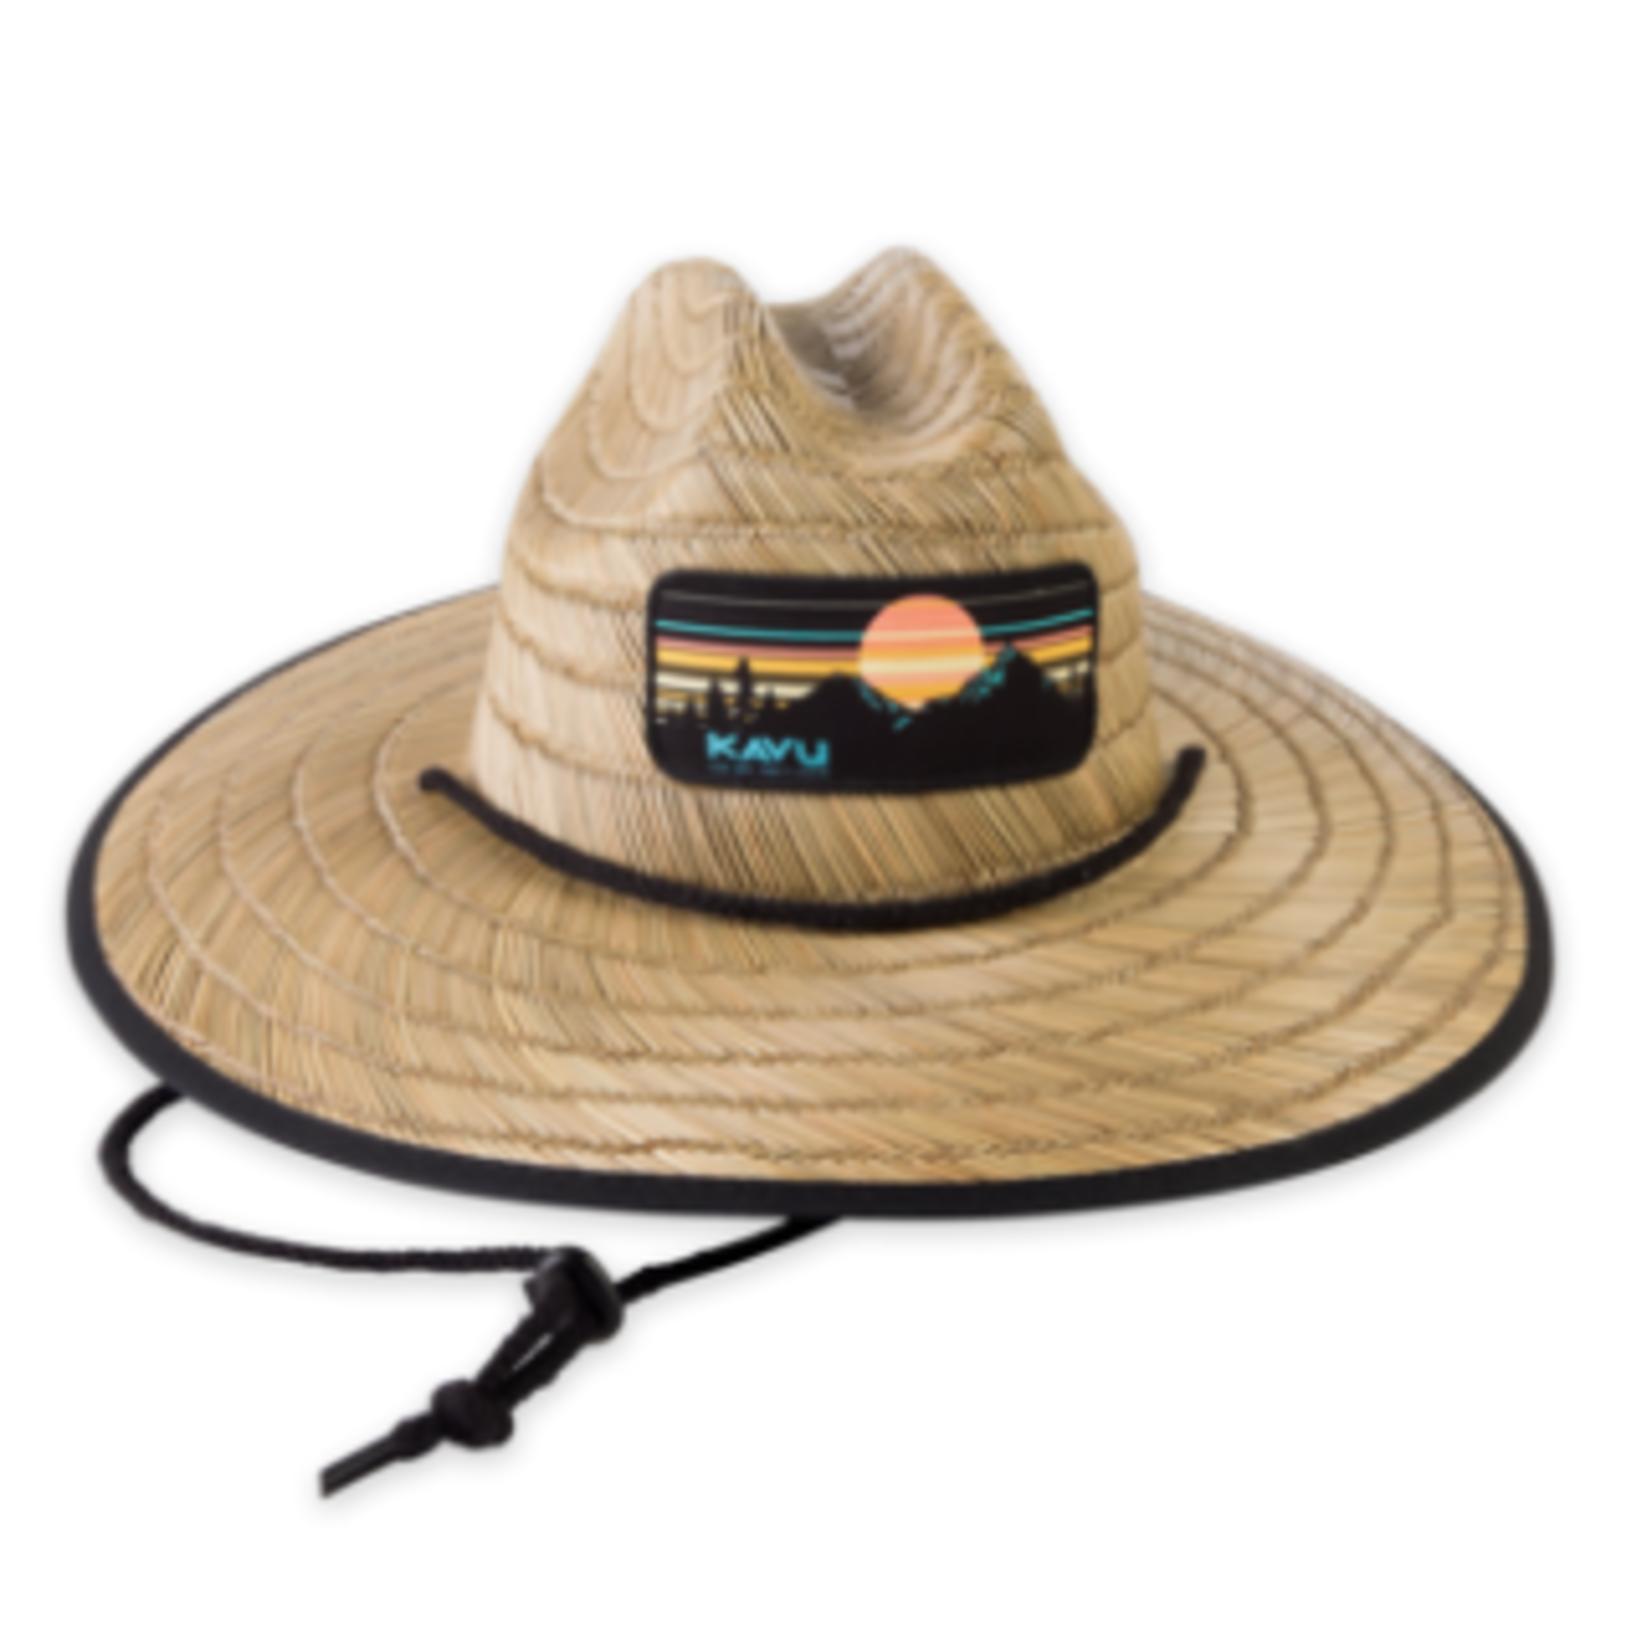 Kavu Kavu Sundee Hat